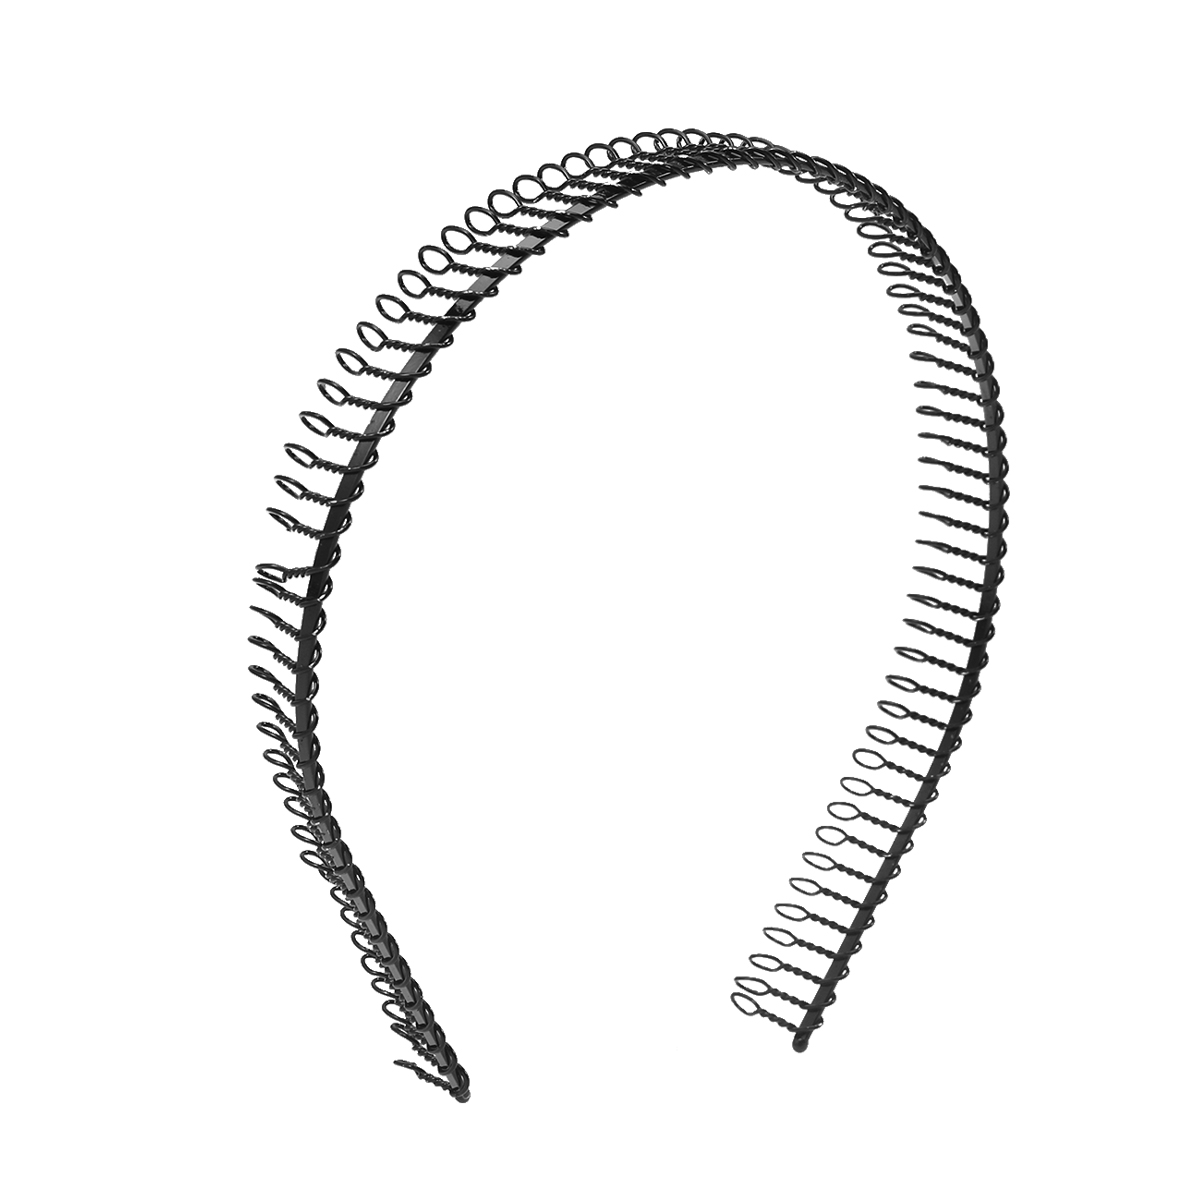 New Practical Black Metal Teeth Comb Hairband Headband For Woman